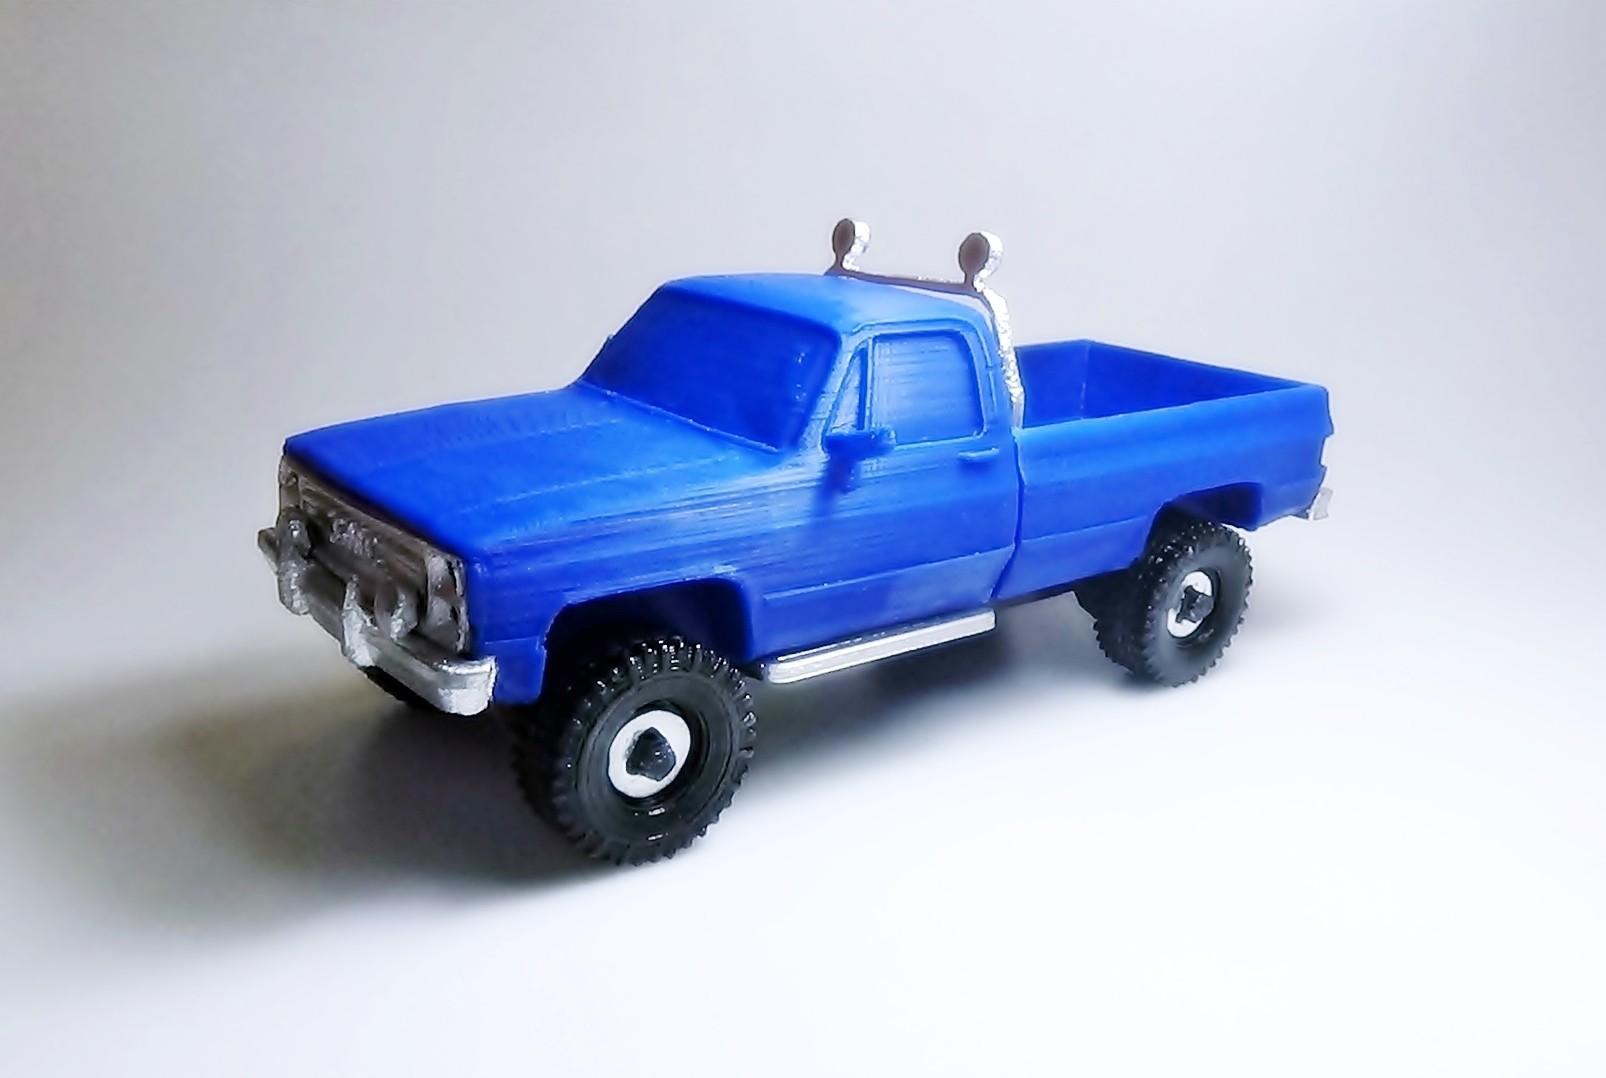 DSC01682 - copia.JPG Download STL file gmc sierra truck • Template to 3D print, 3Diego